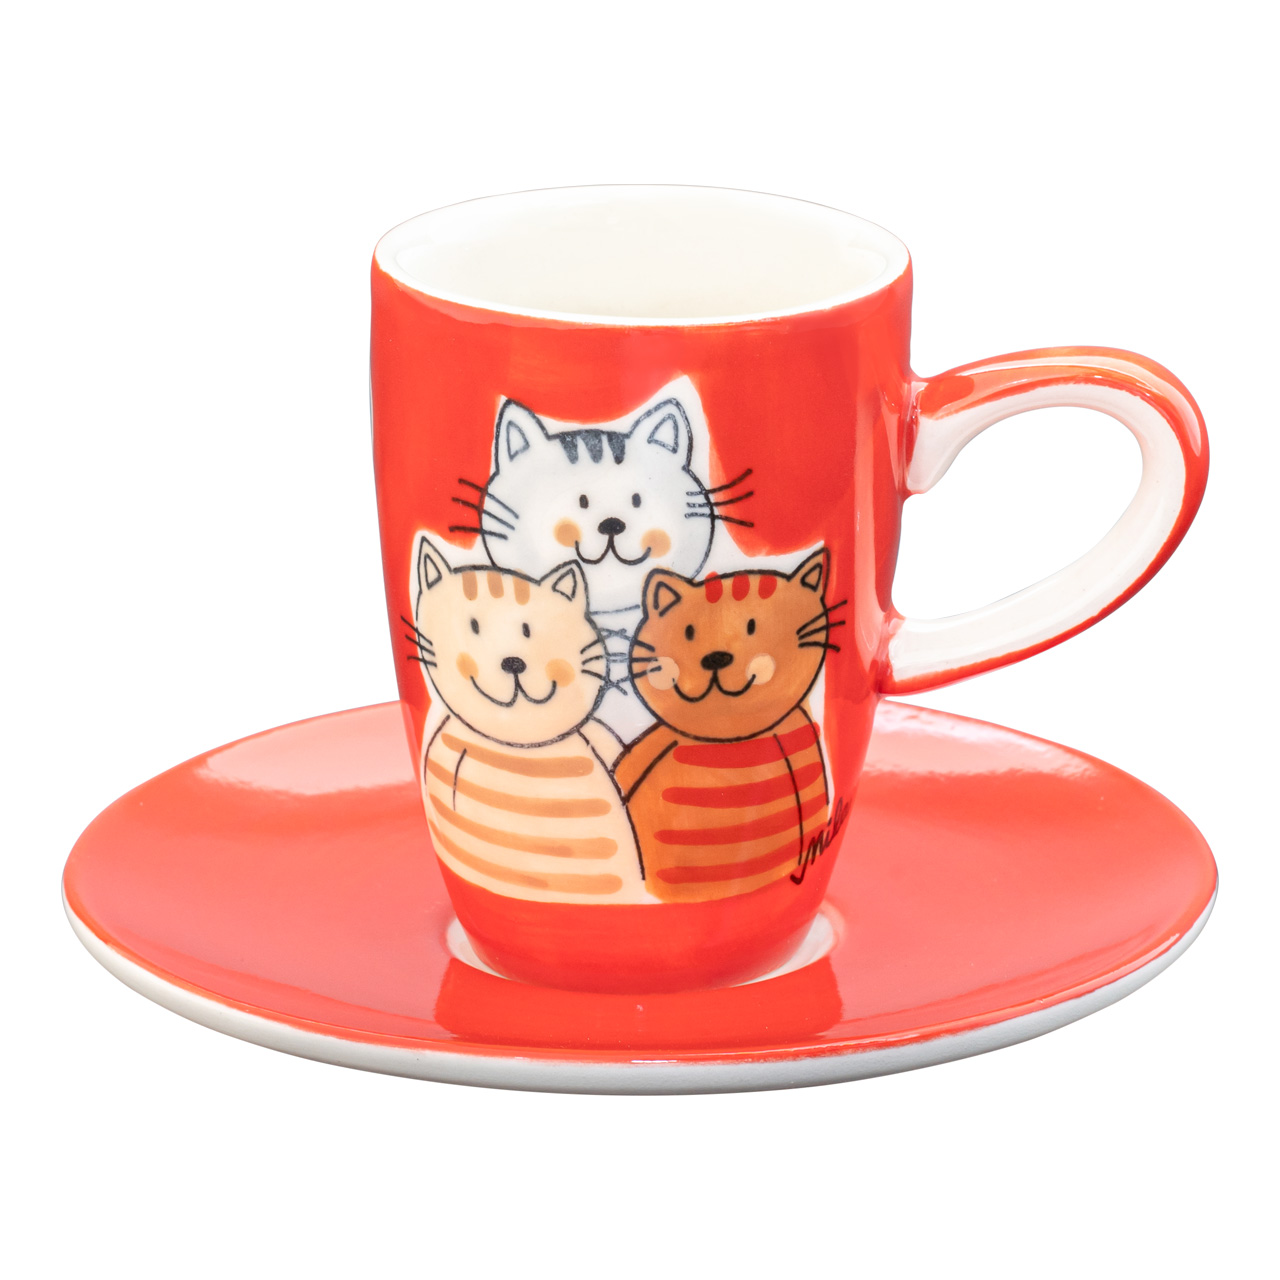 Epresso Tasse - Cuddly Cats